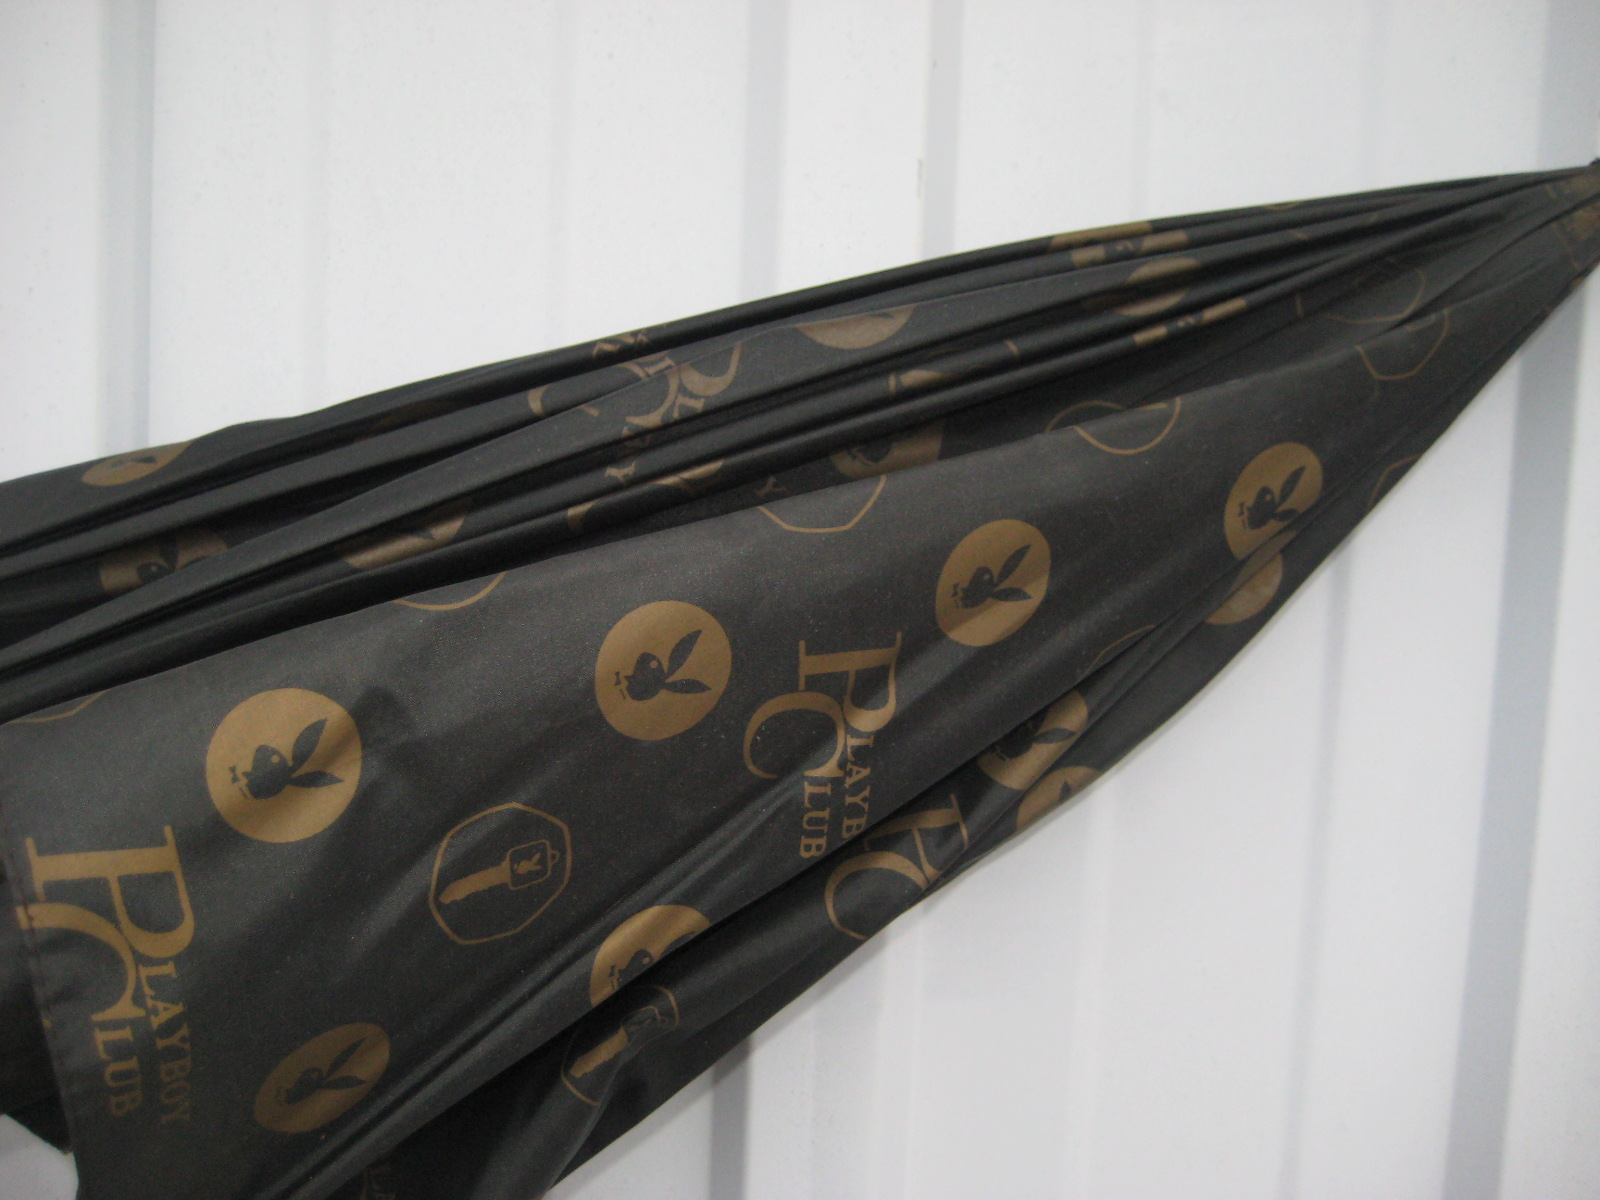 Playboy Club Umbrella